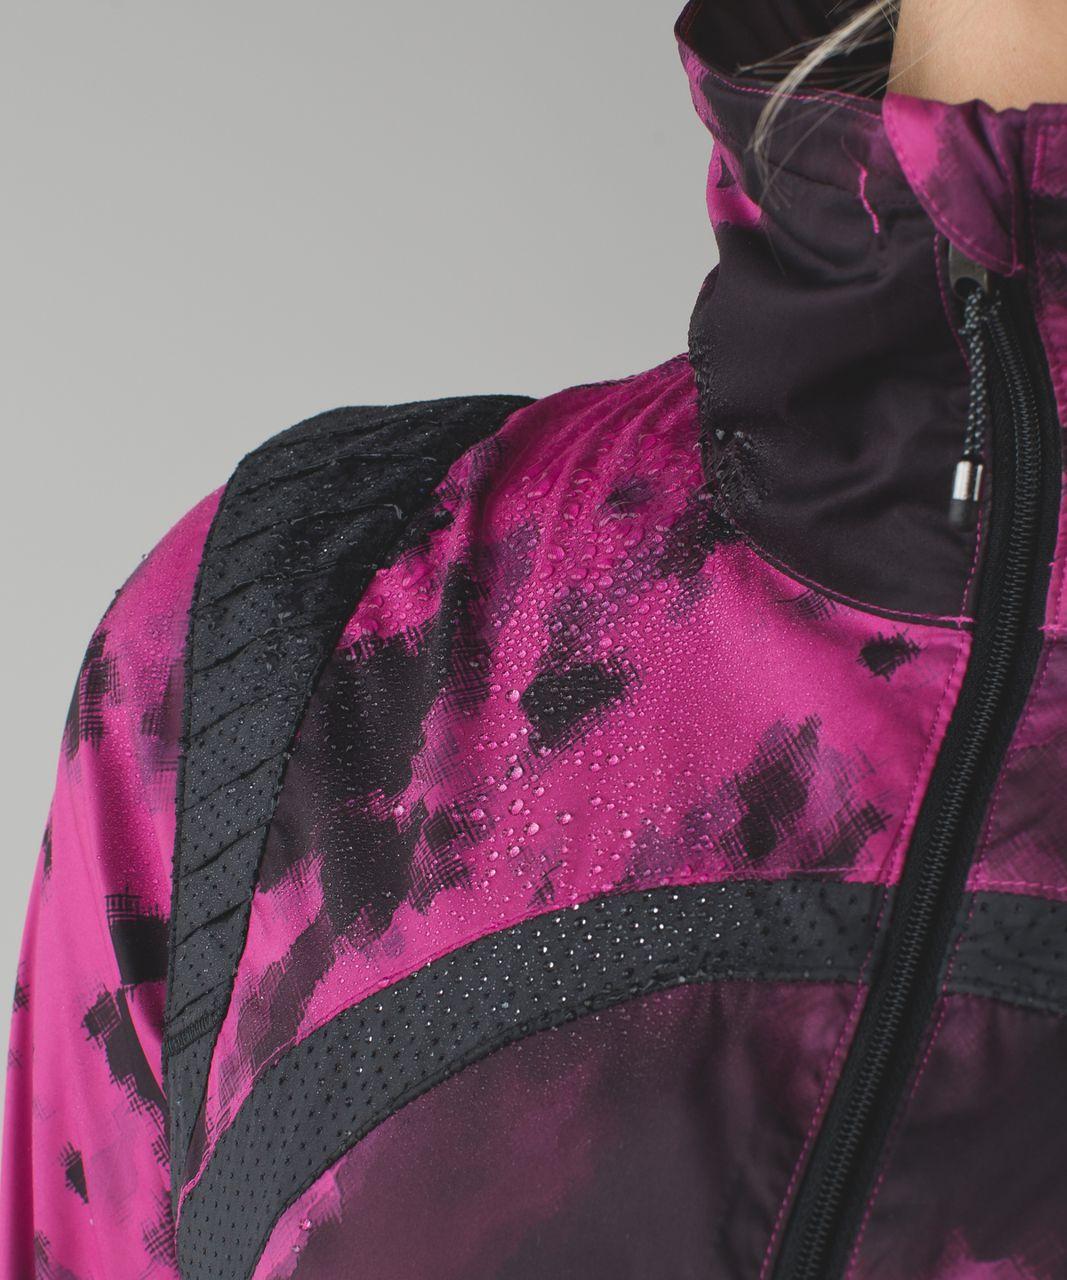 Lululemon Vent It Out Jacket - Blooming Pixie Raspberry Black / Black